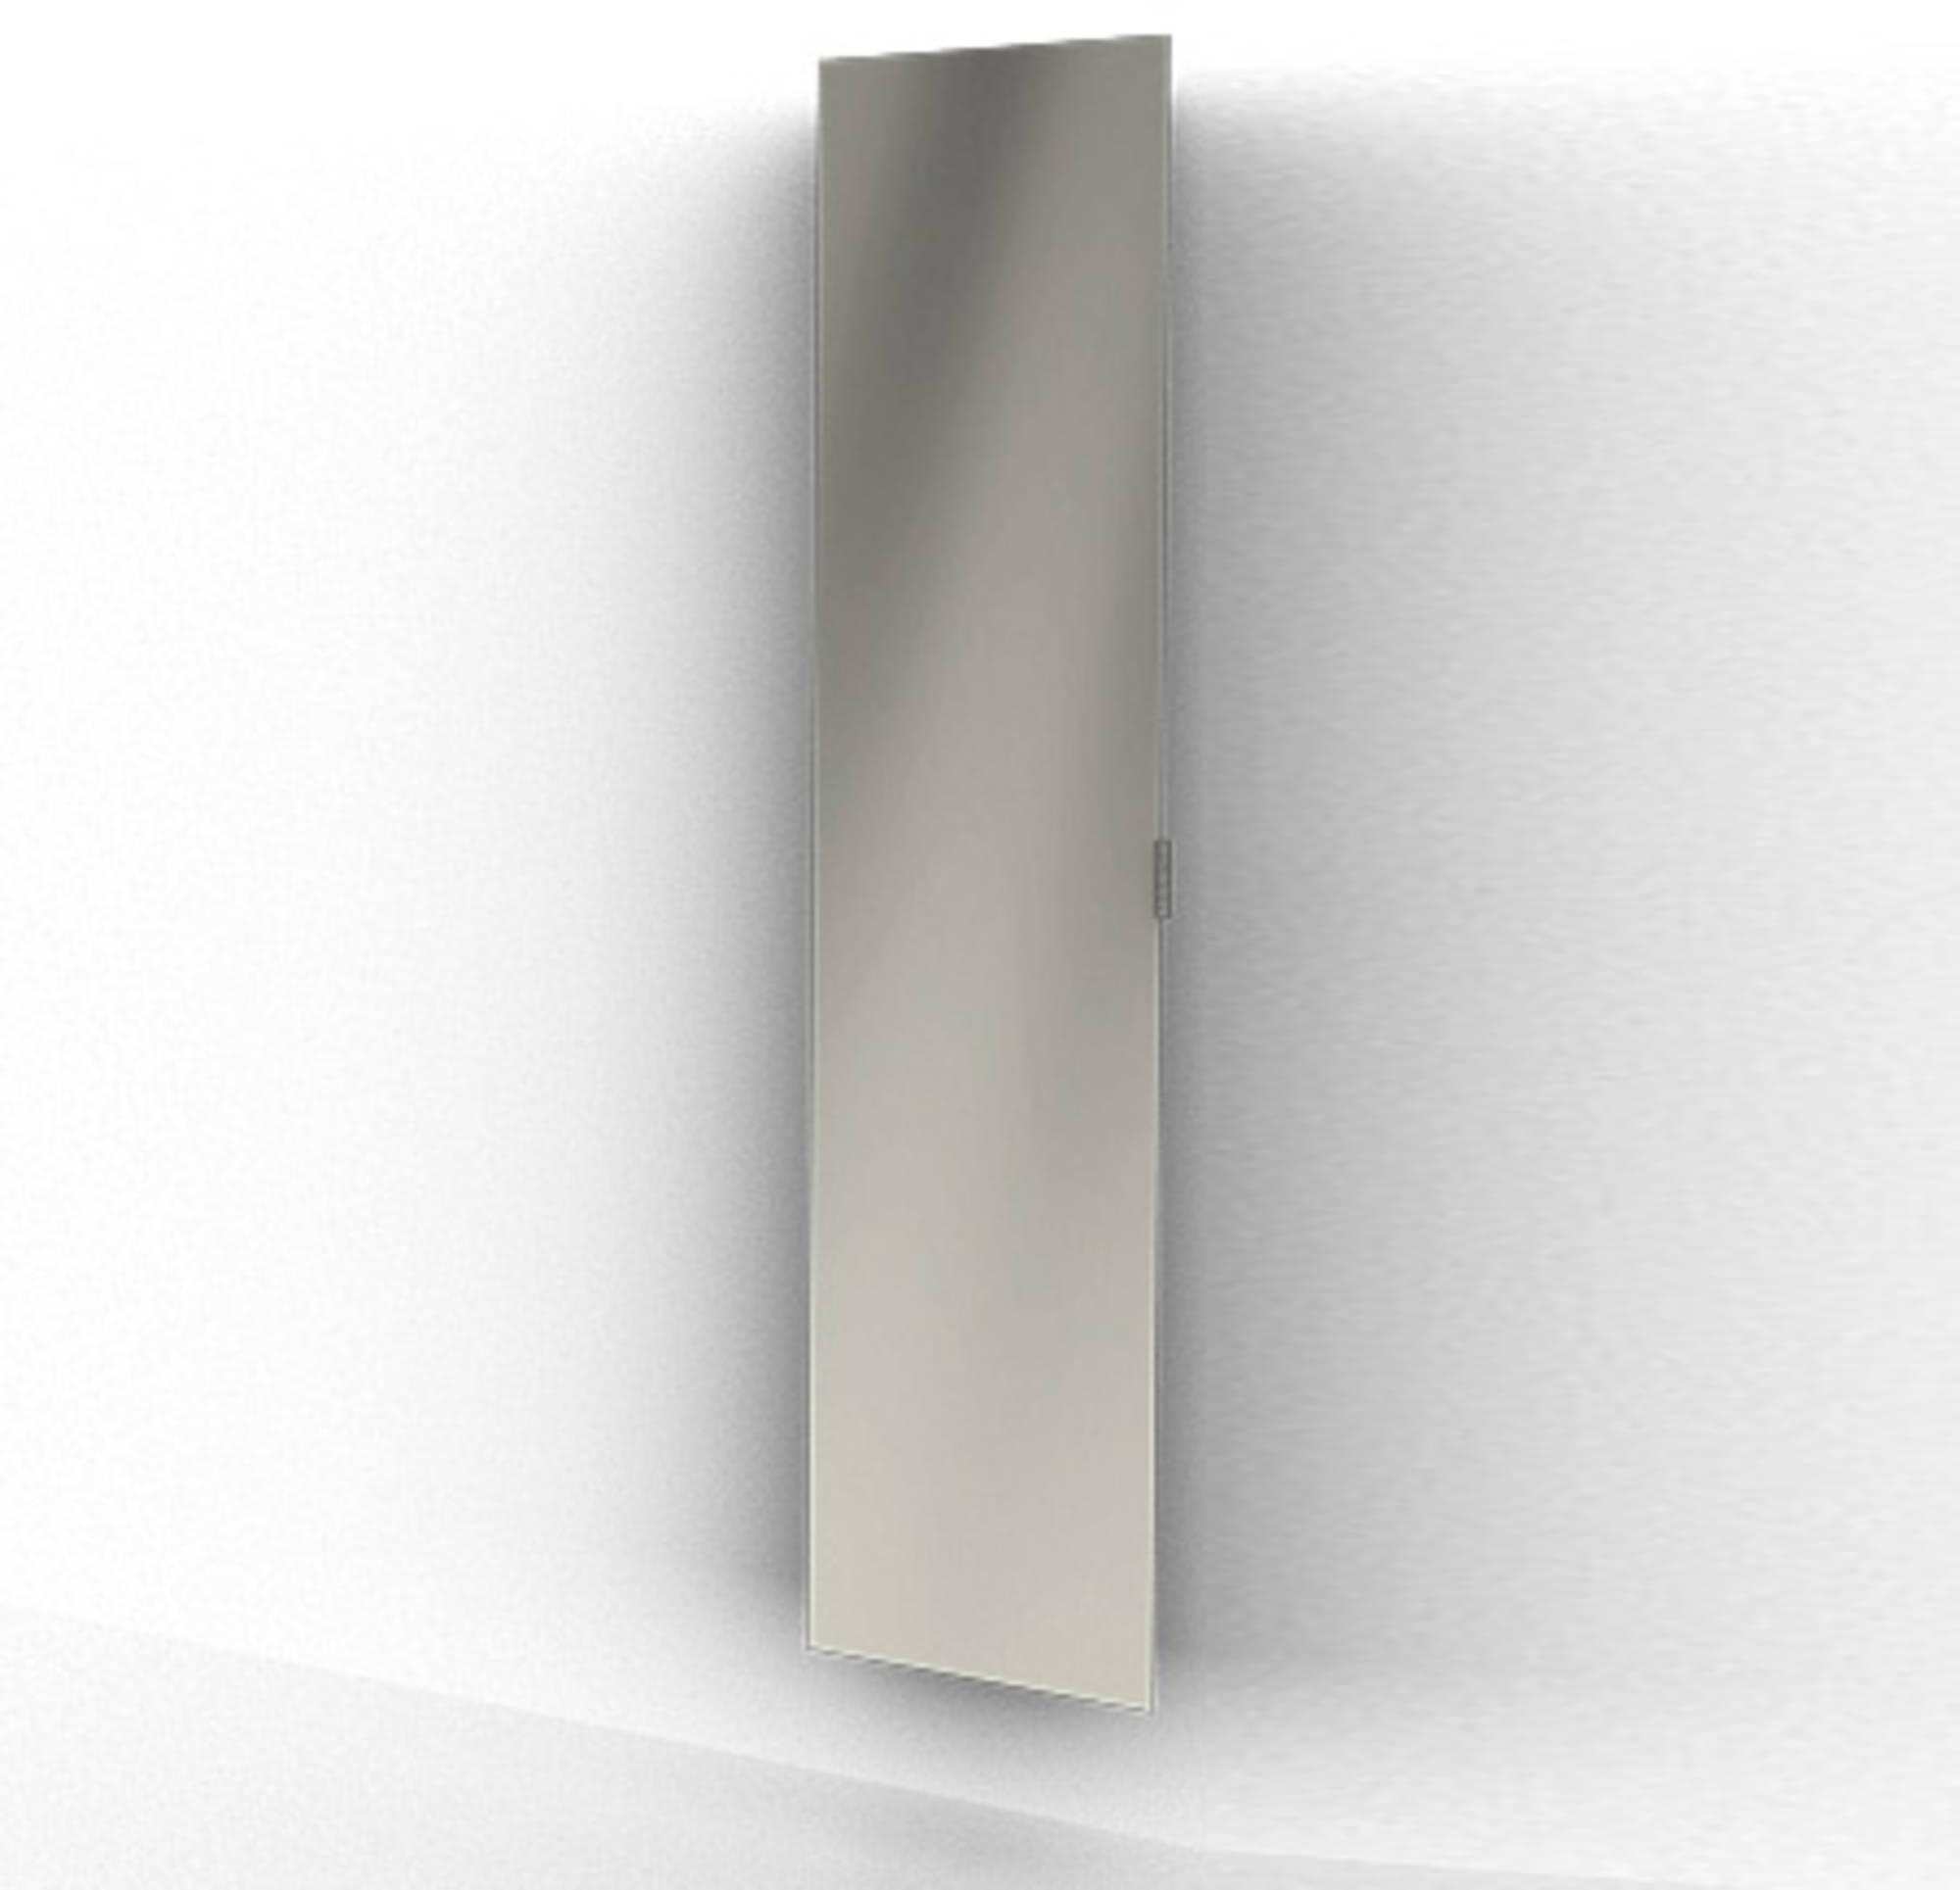 Ben Magno Hoge Spiegelkast Aluminium 35cm